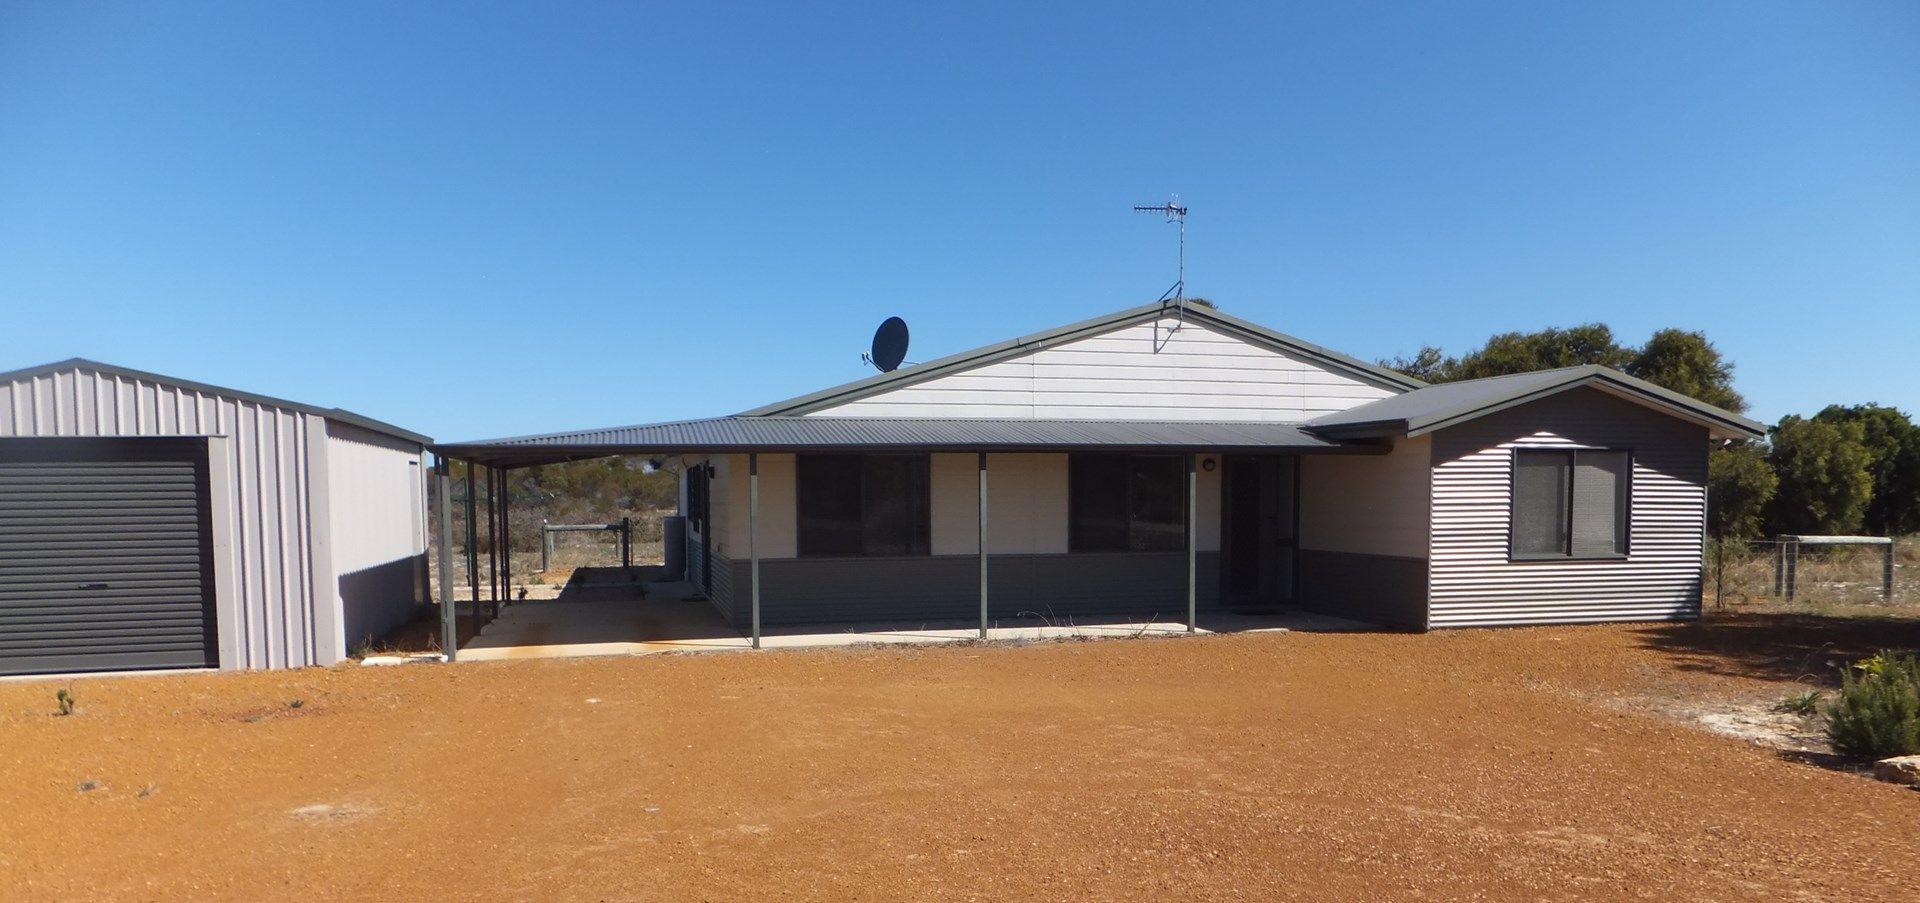 165 Banksia Road, Hopetoun WA 6348, Image 0